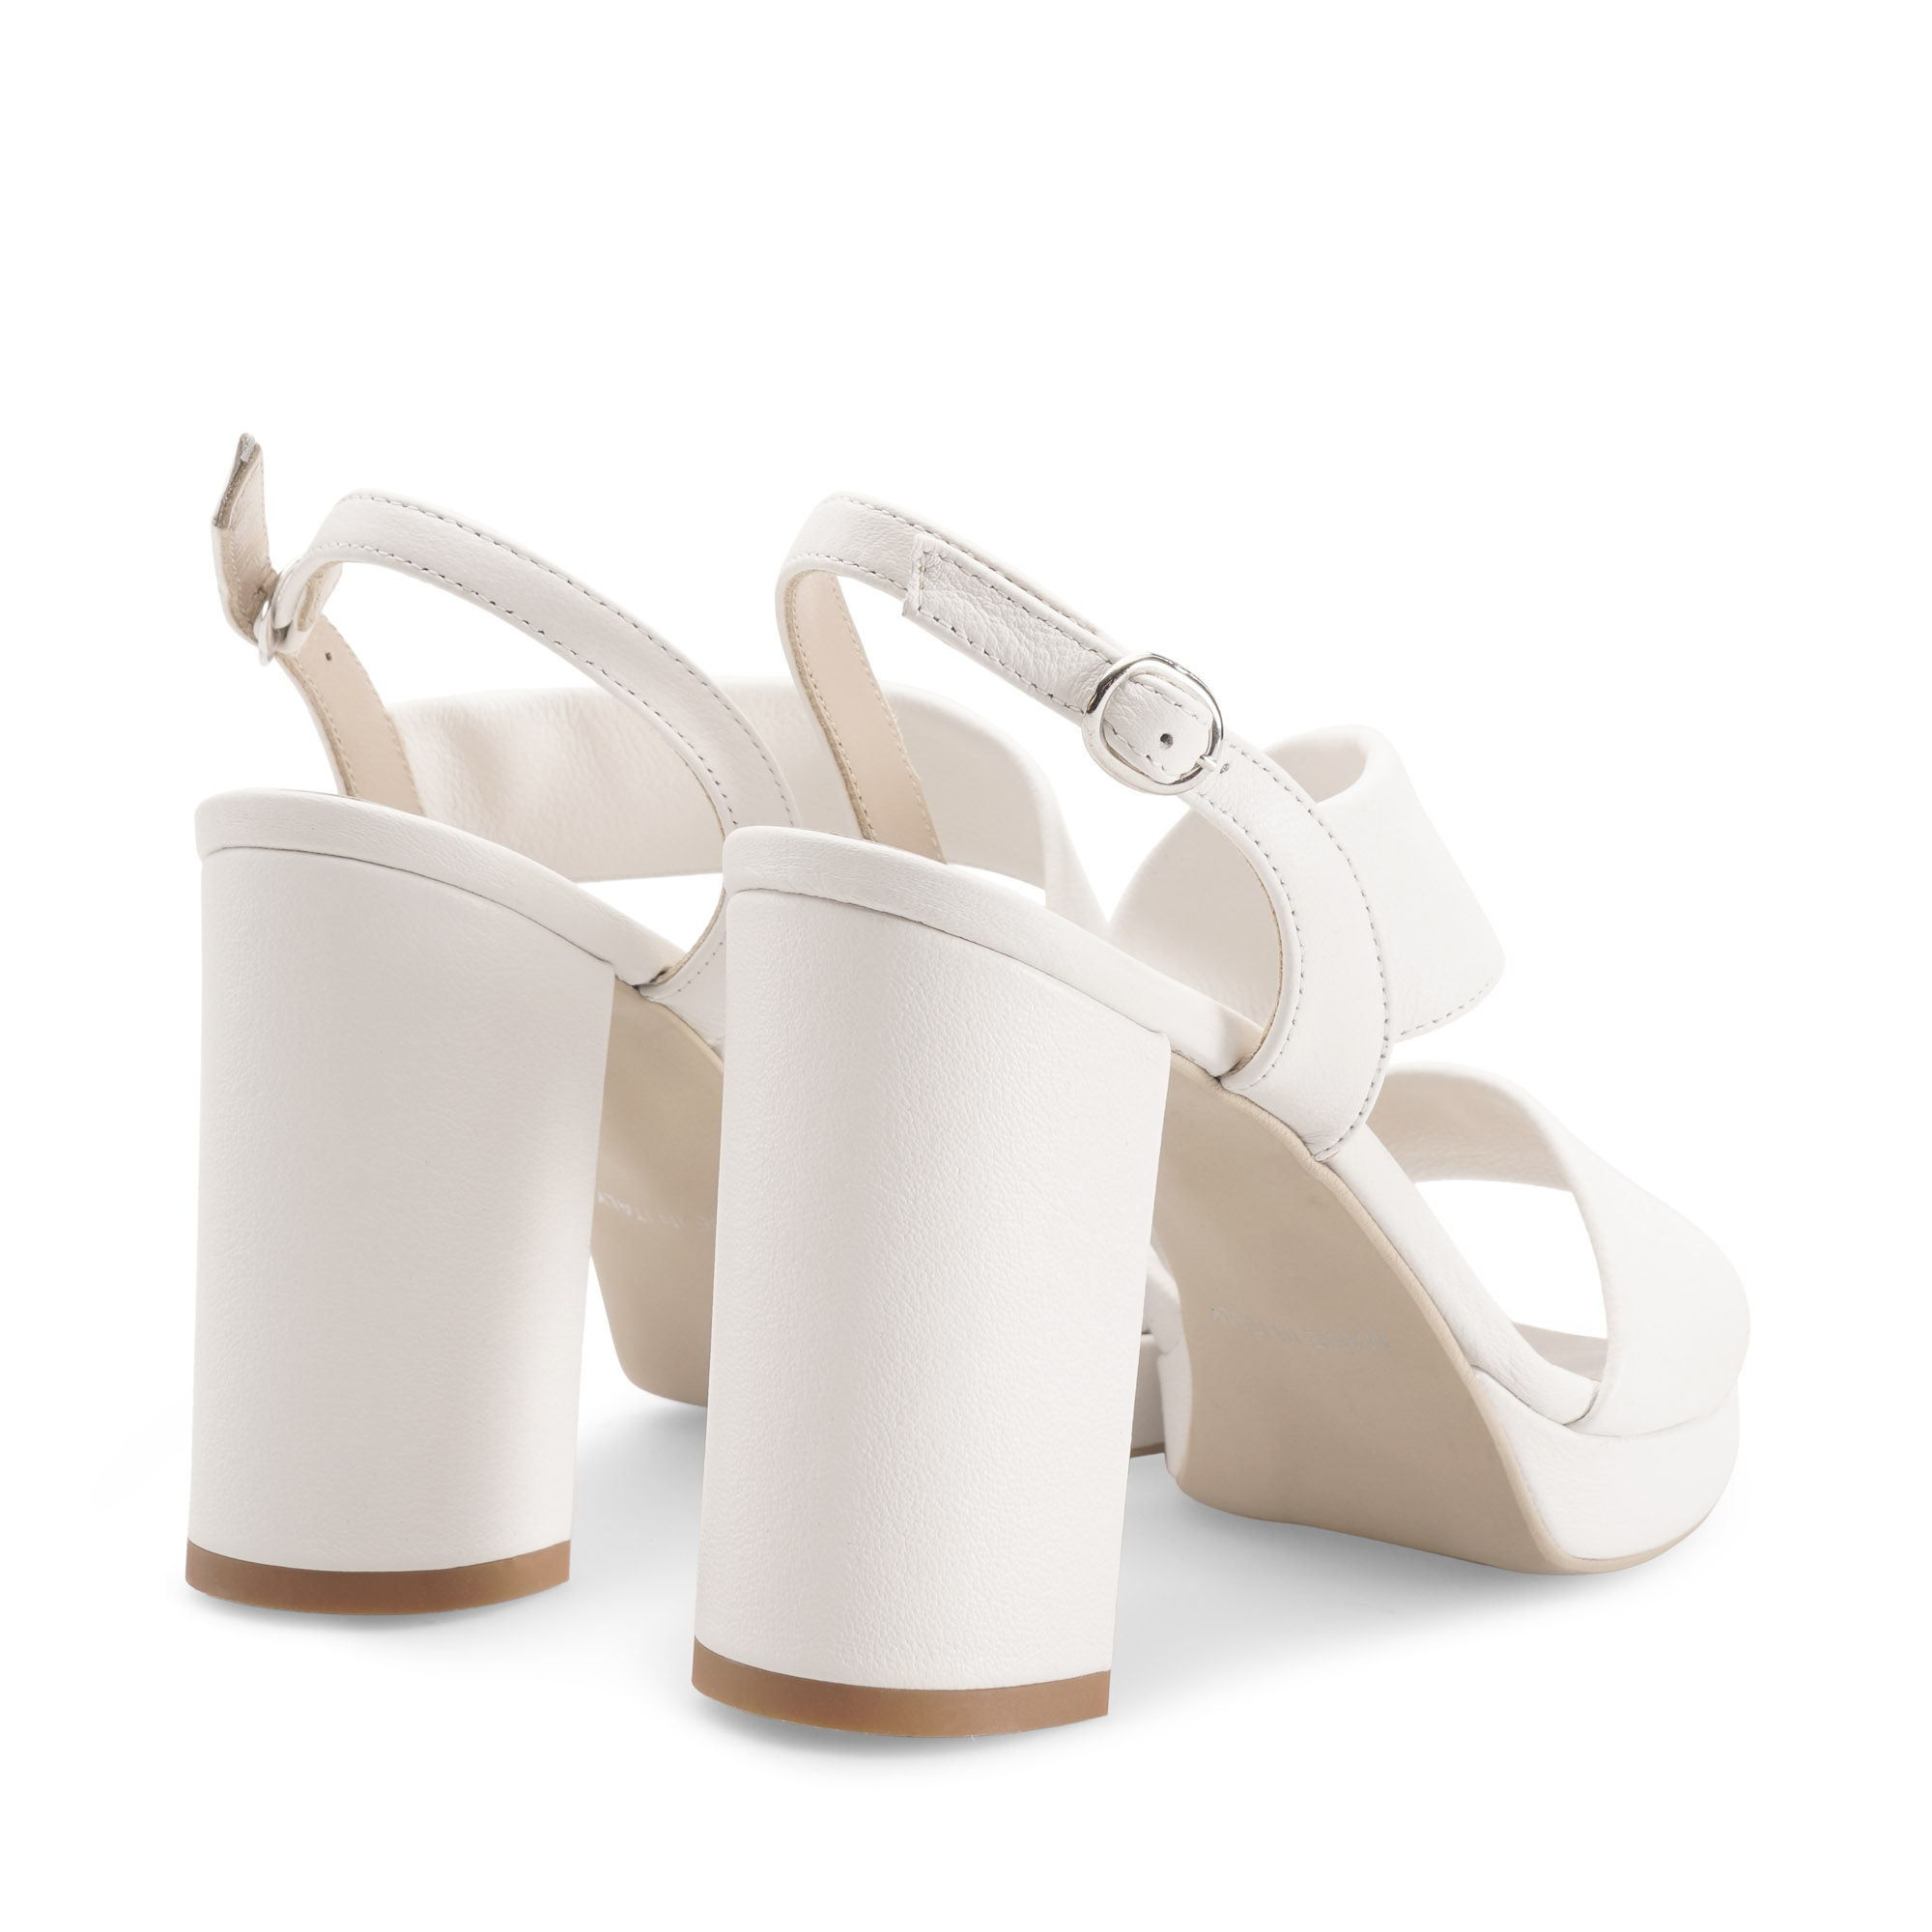 sandalo-pelle-bianco-plateau-piantina-tacco-emanuela-passeri-shoes-heels-spring-summer-2021